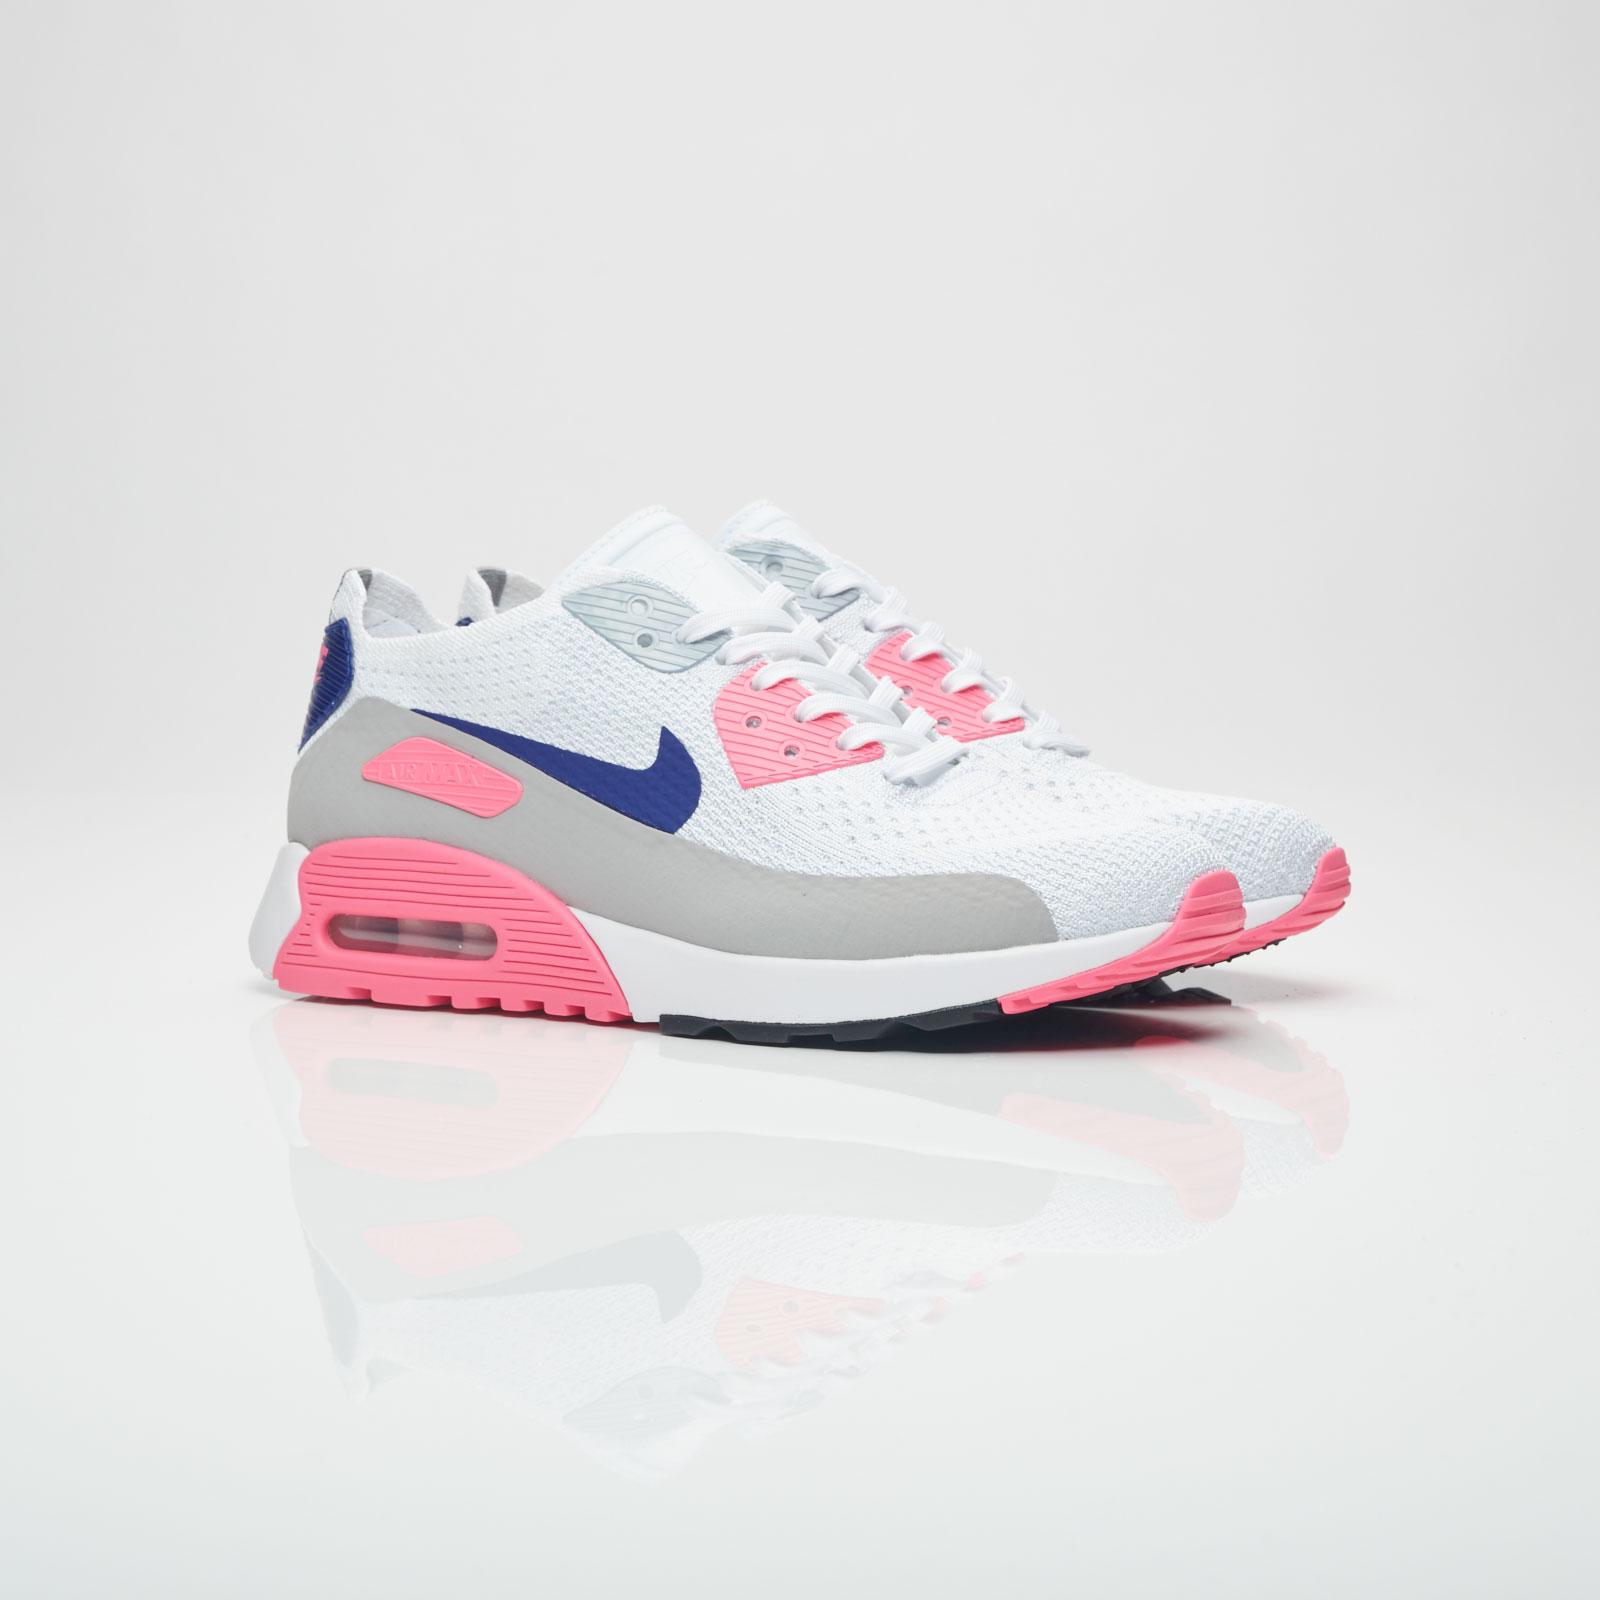 8111c7bc4670 Nike Wmns Air Max 90 Ultra 2.0 Flyknit - 881109-101 - Sneakersnstuff ...